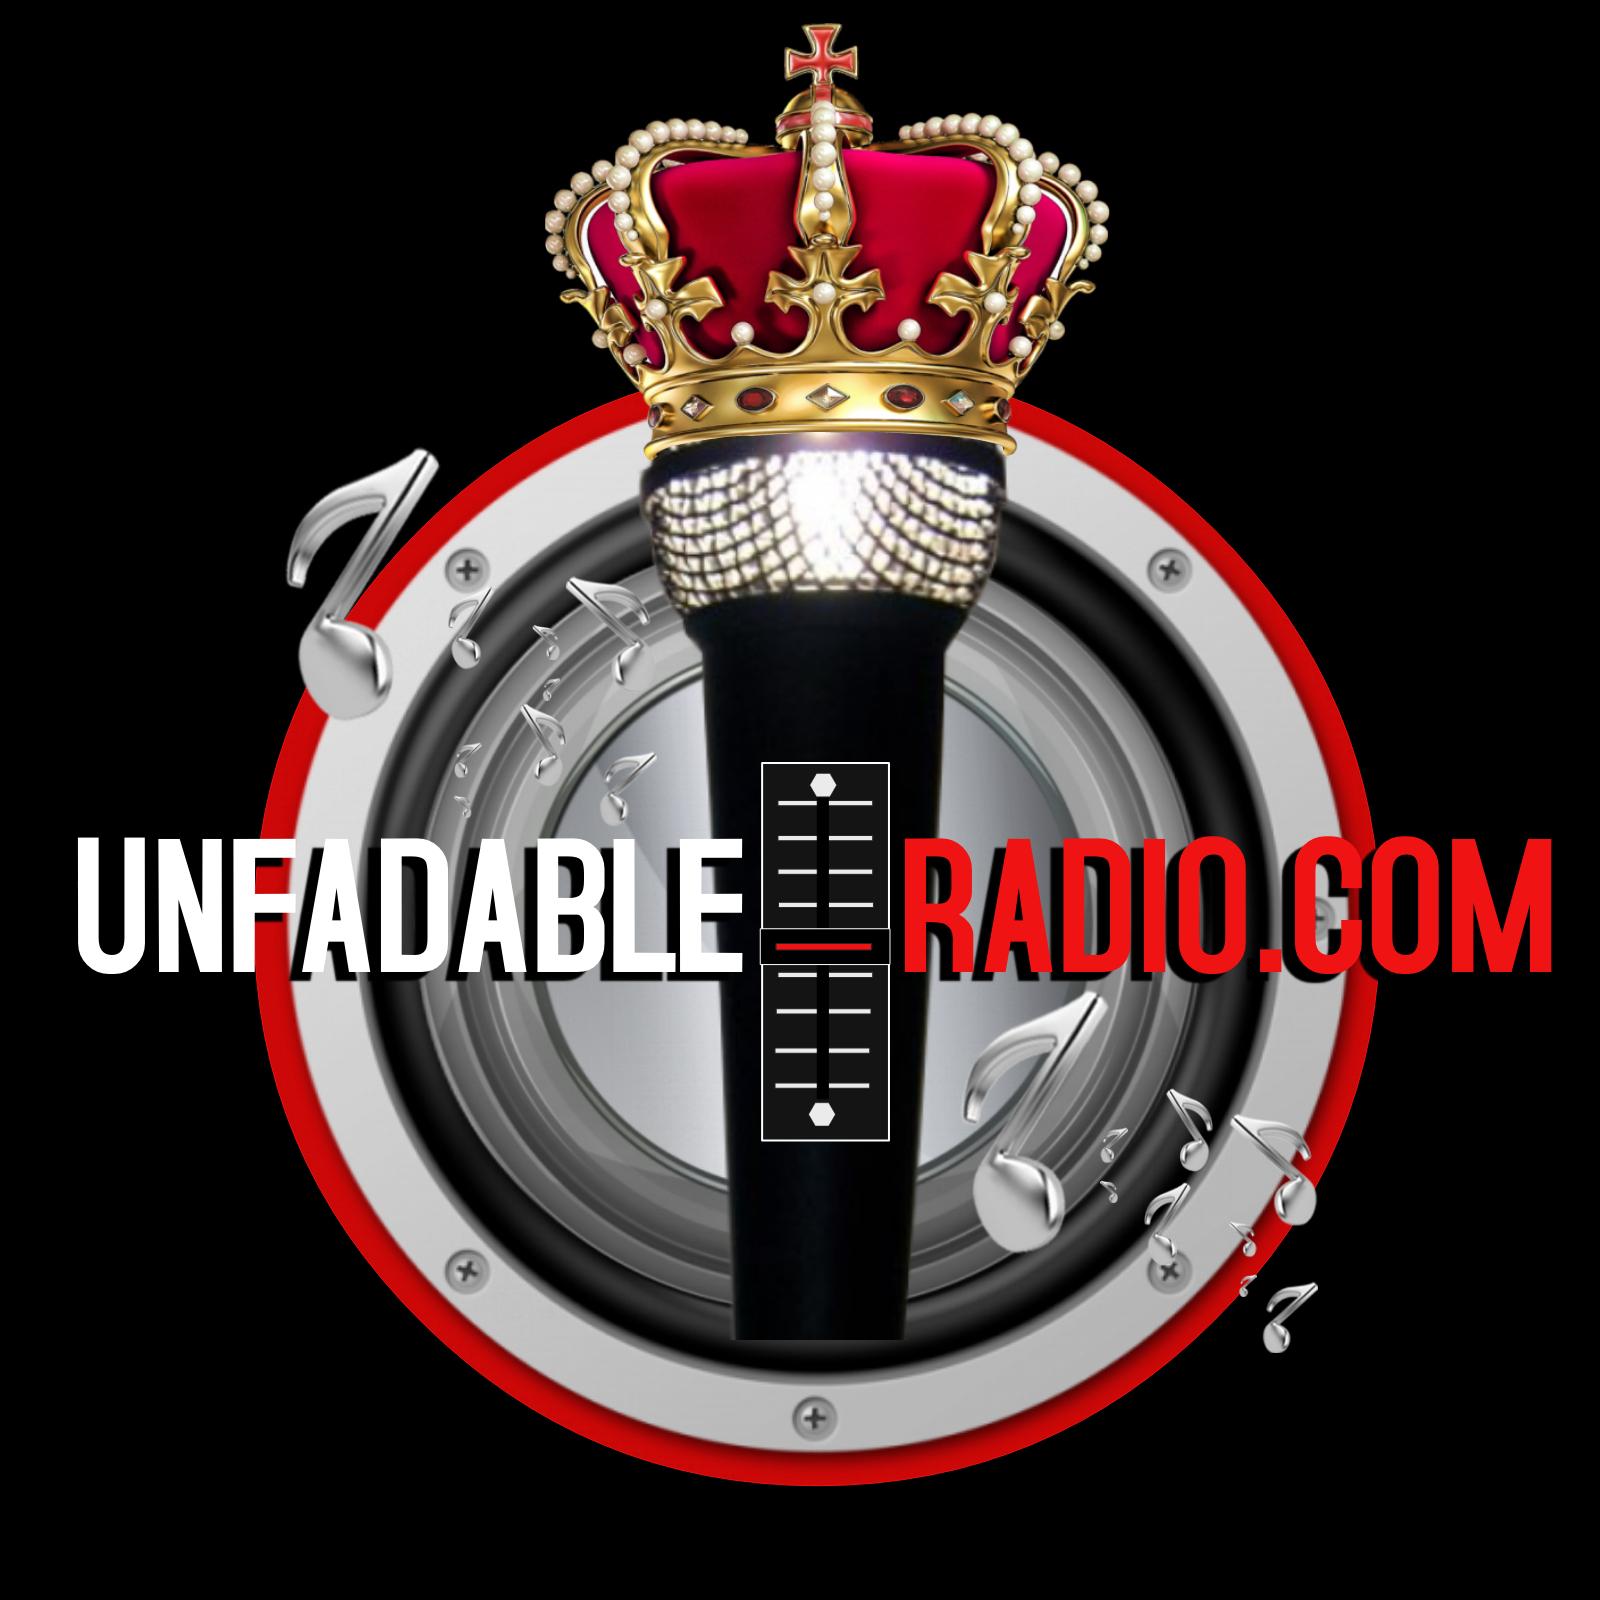 Unfadeableradio.com